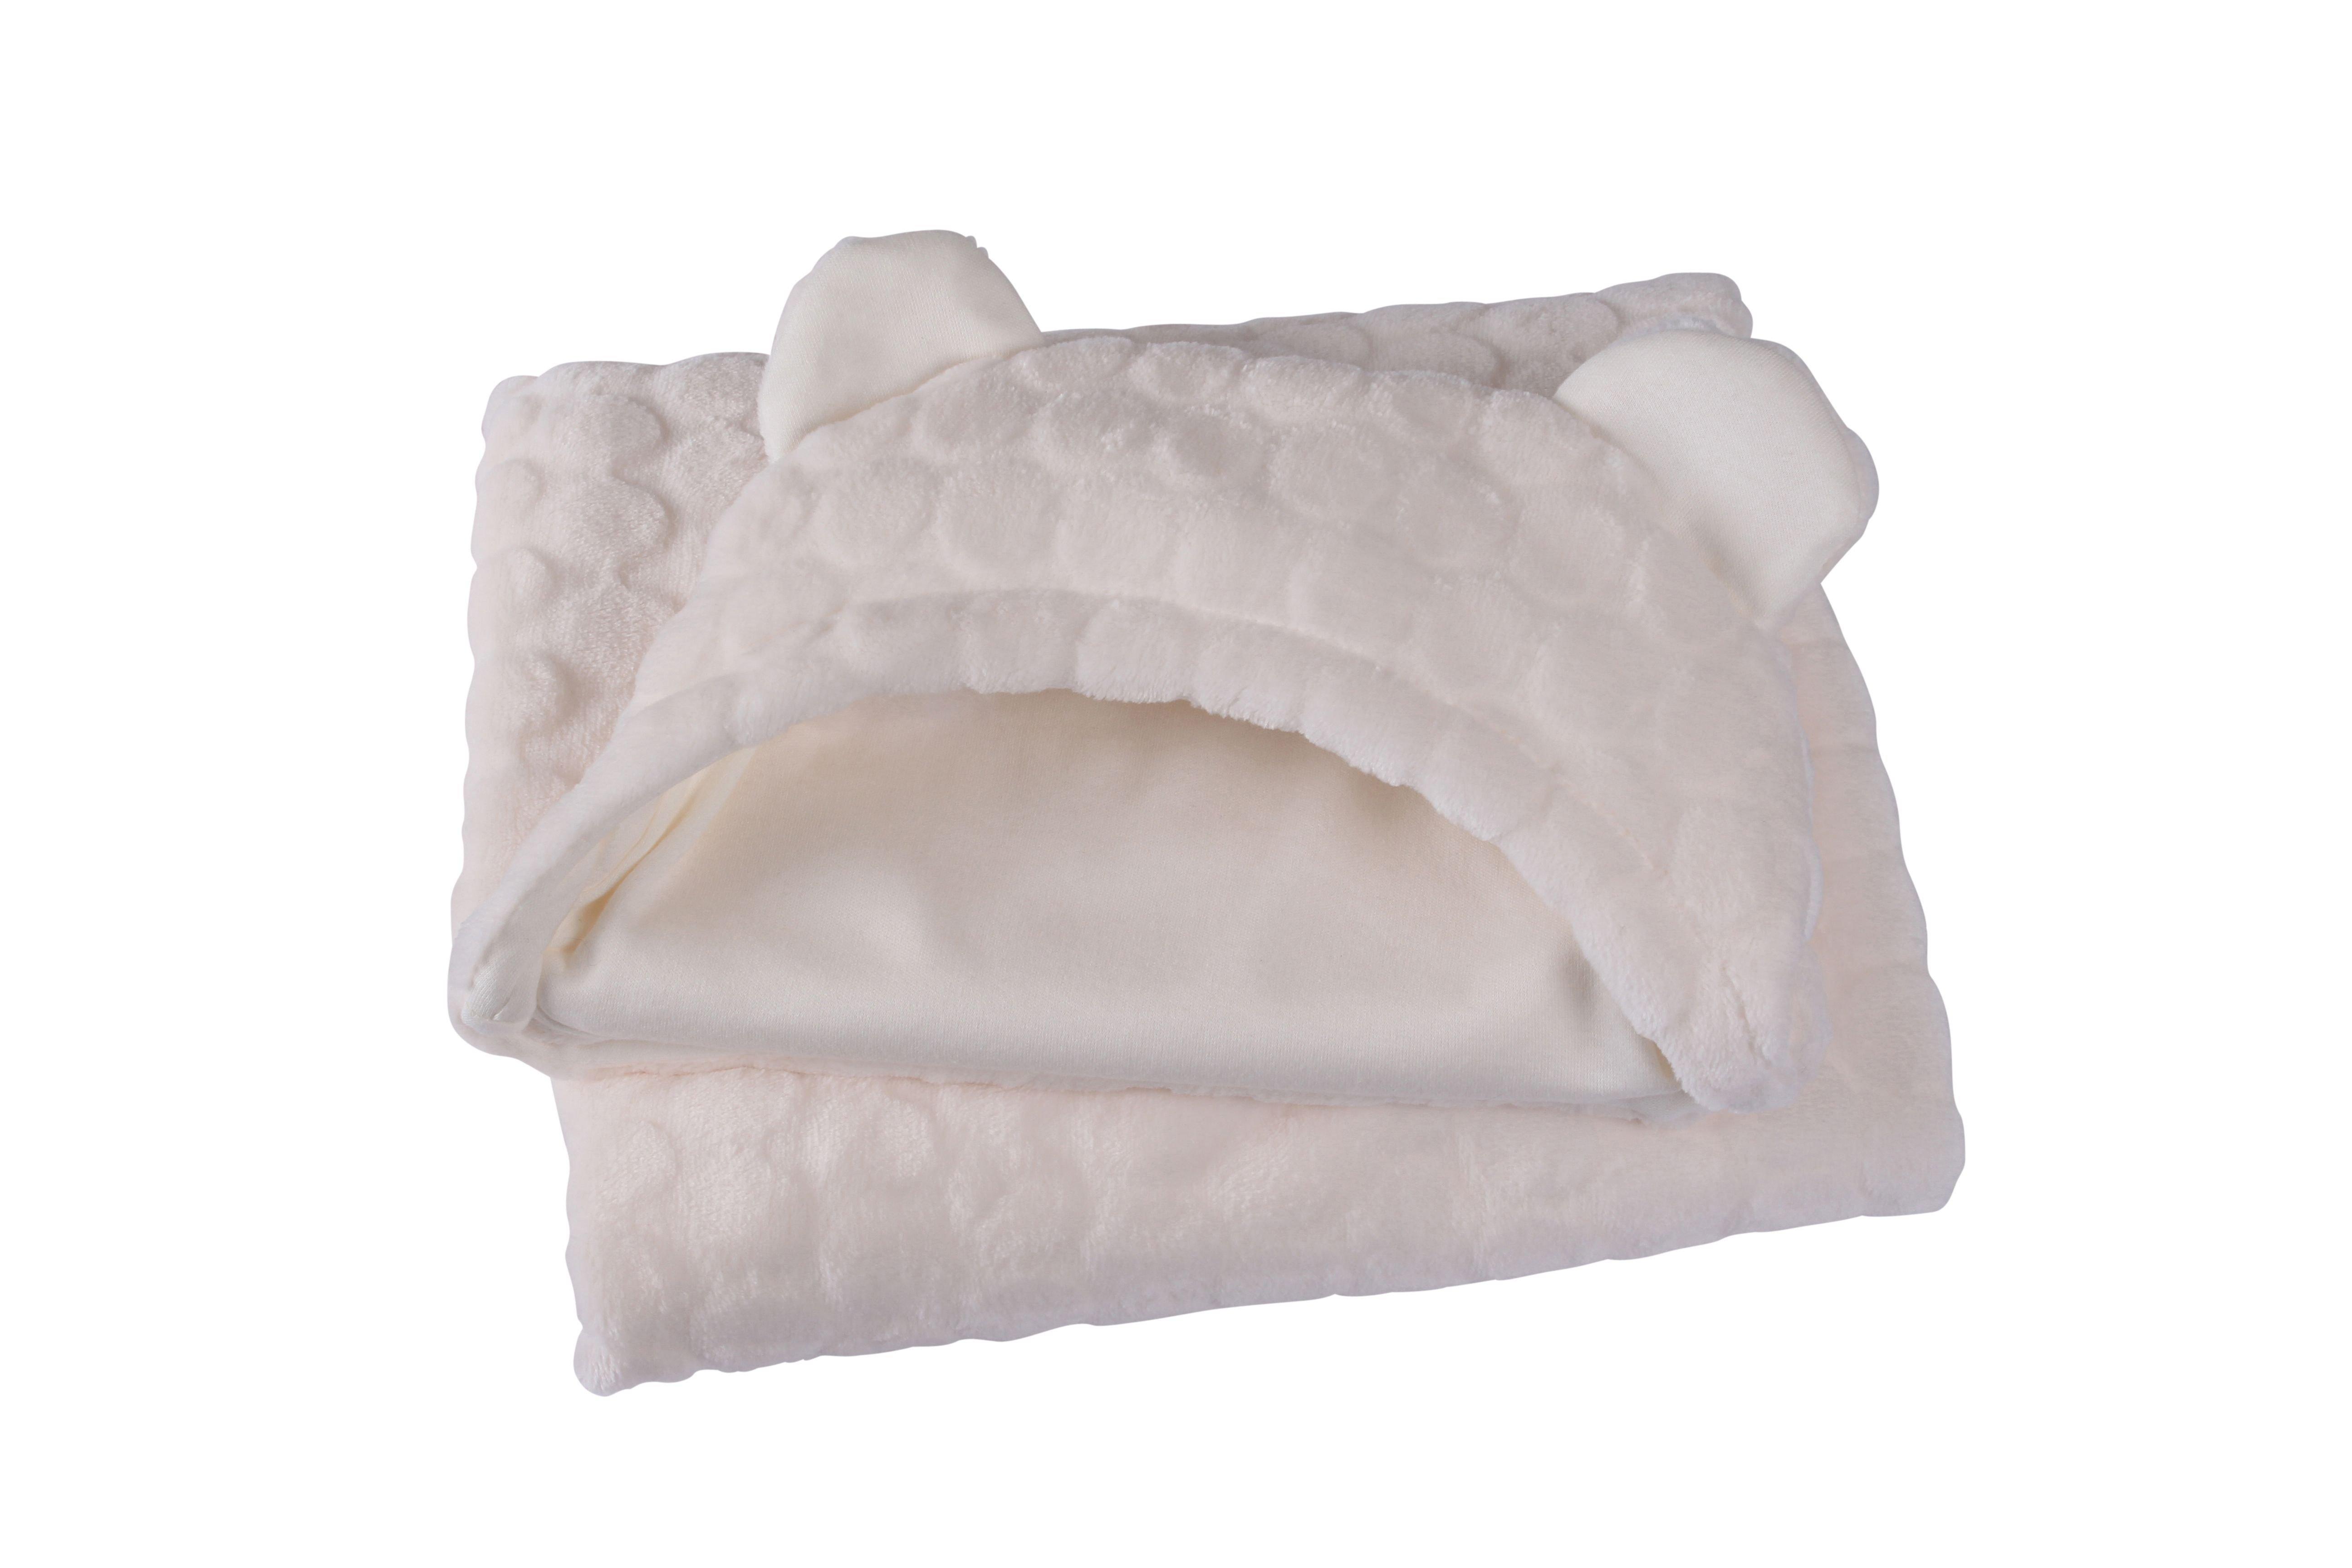 Image of Clair de Lune Marshmallow Teddybear Ear Blanket - Cream.